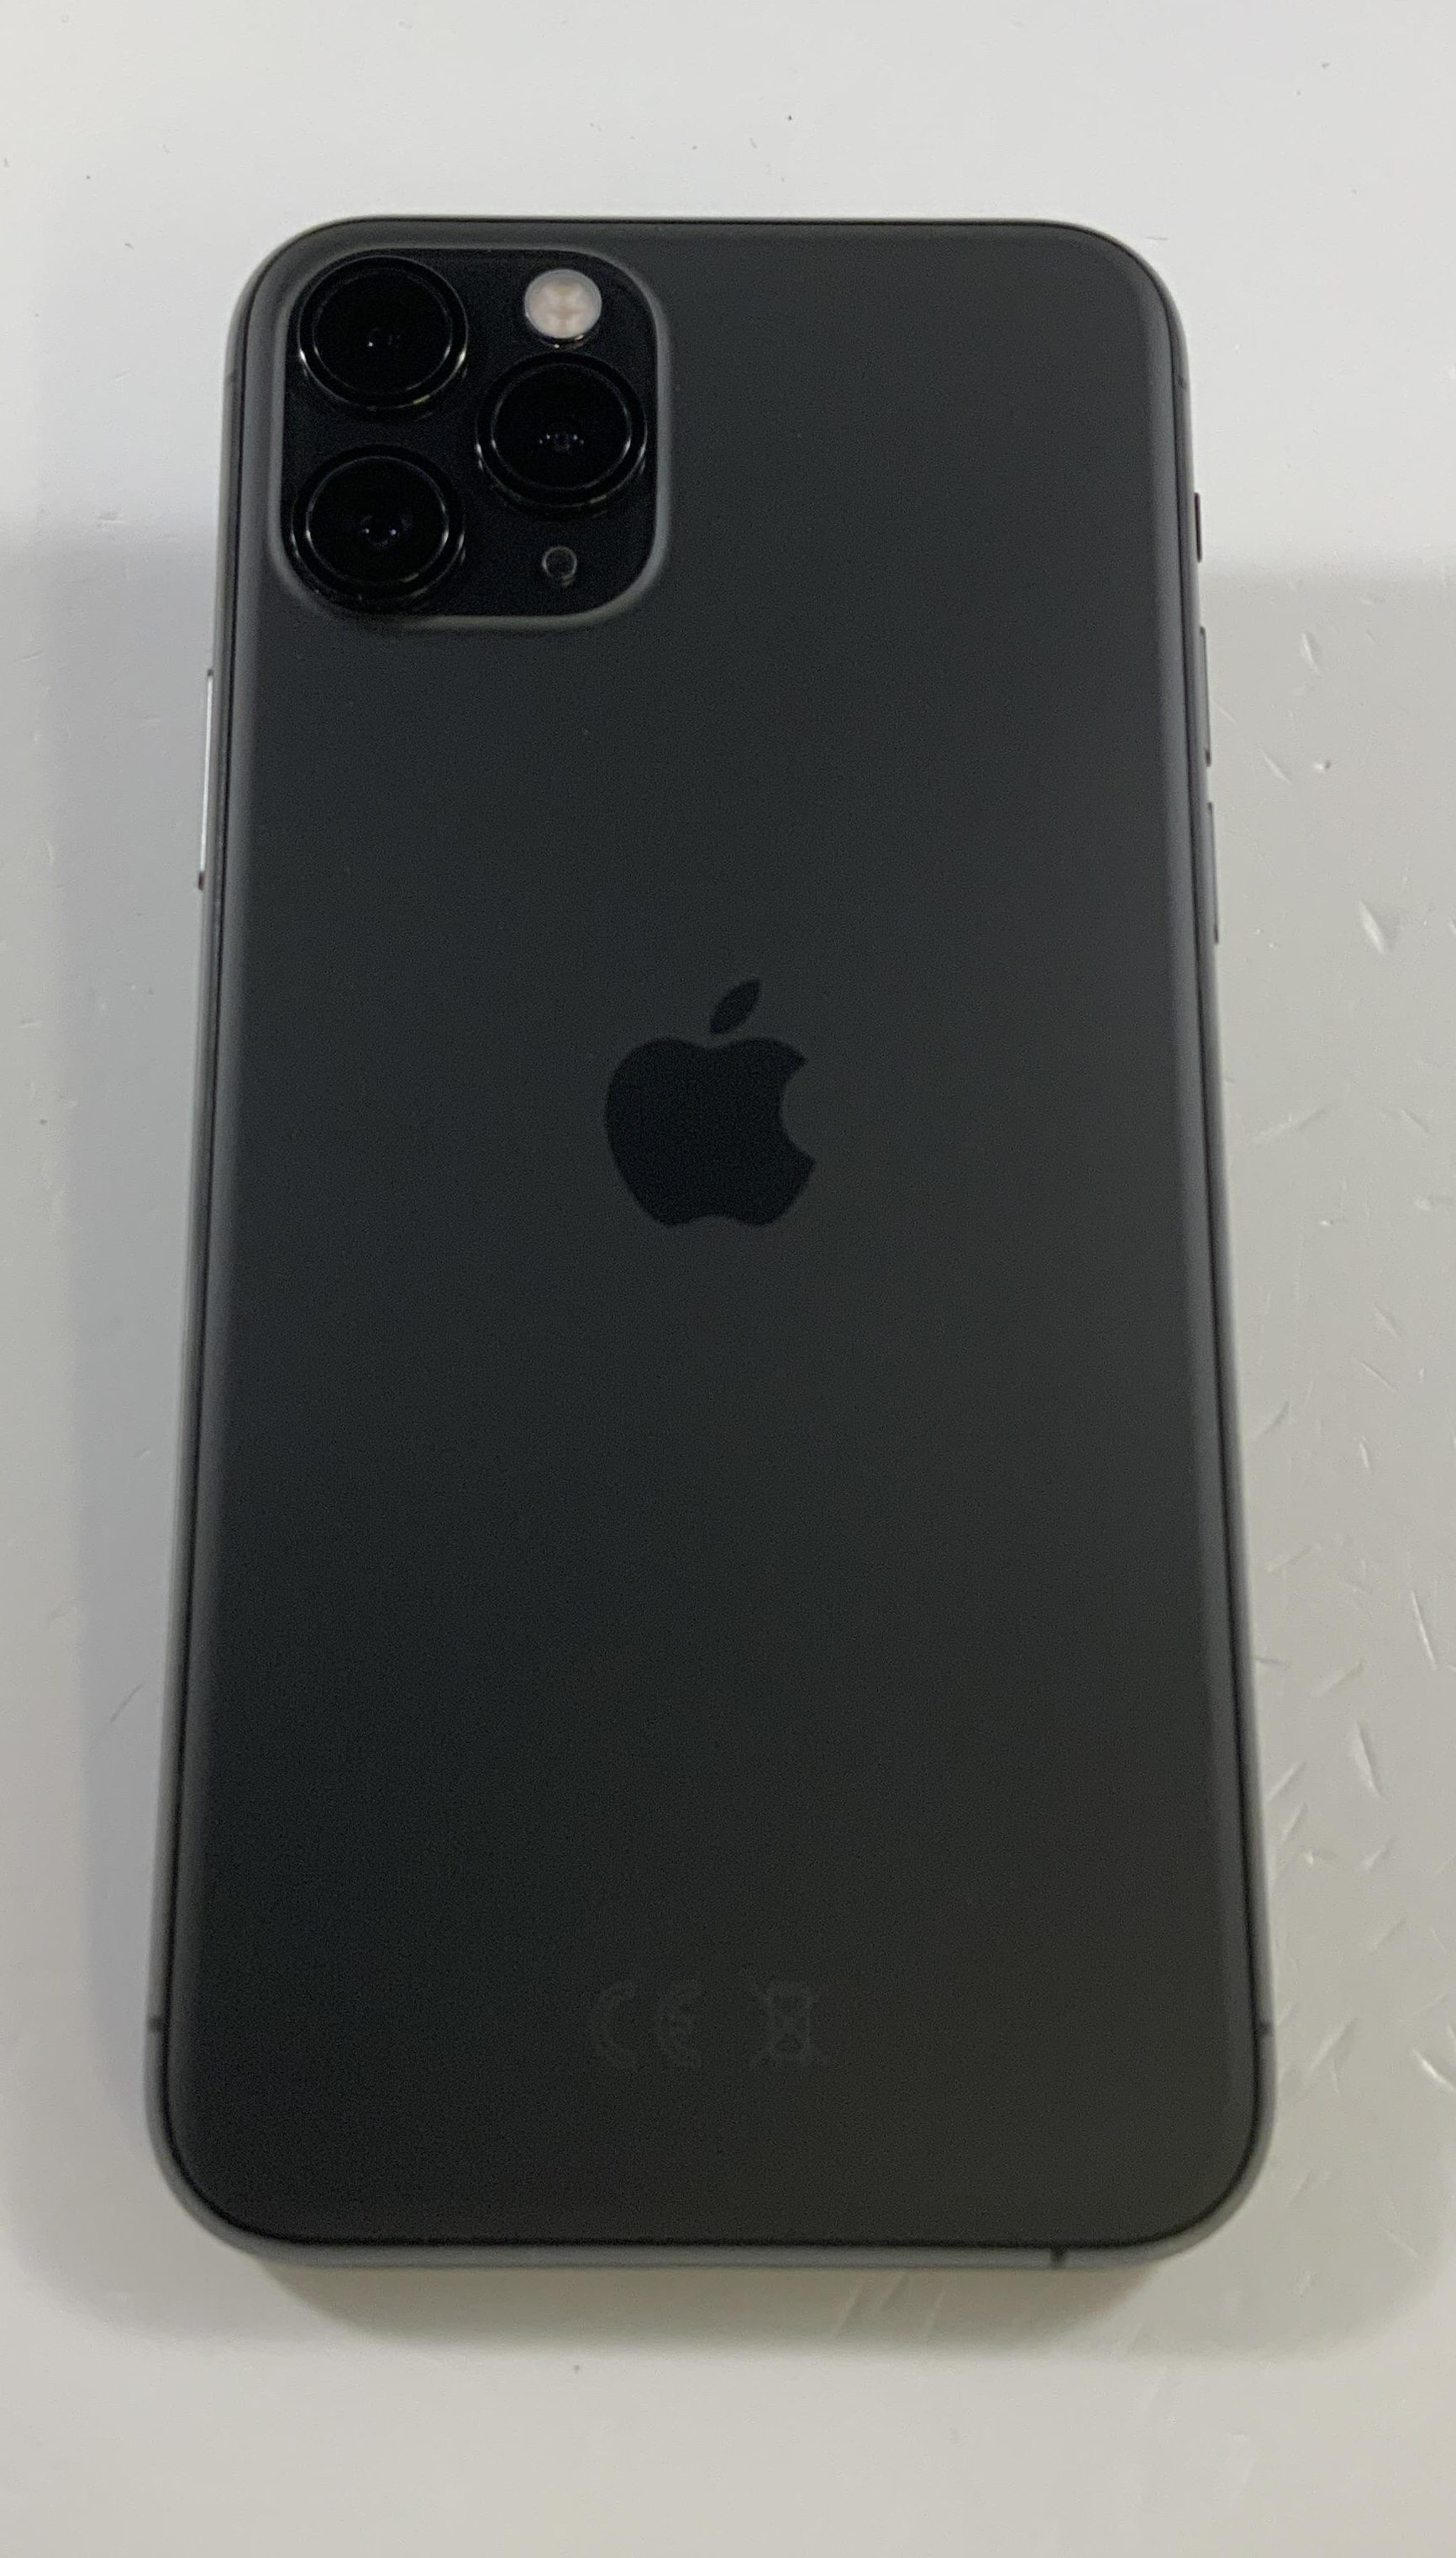 iPhone 11 Pro 64GB, 64GB, Space Gray, immagine 2